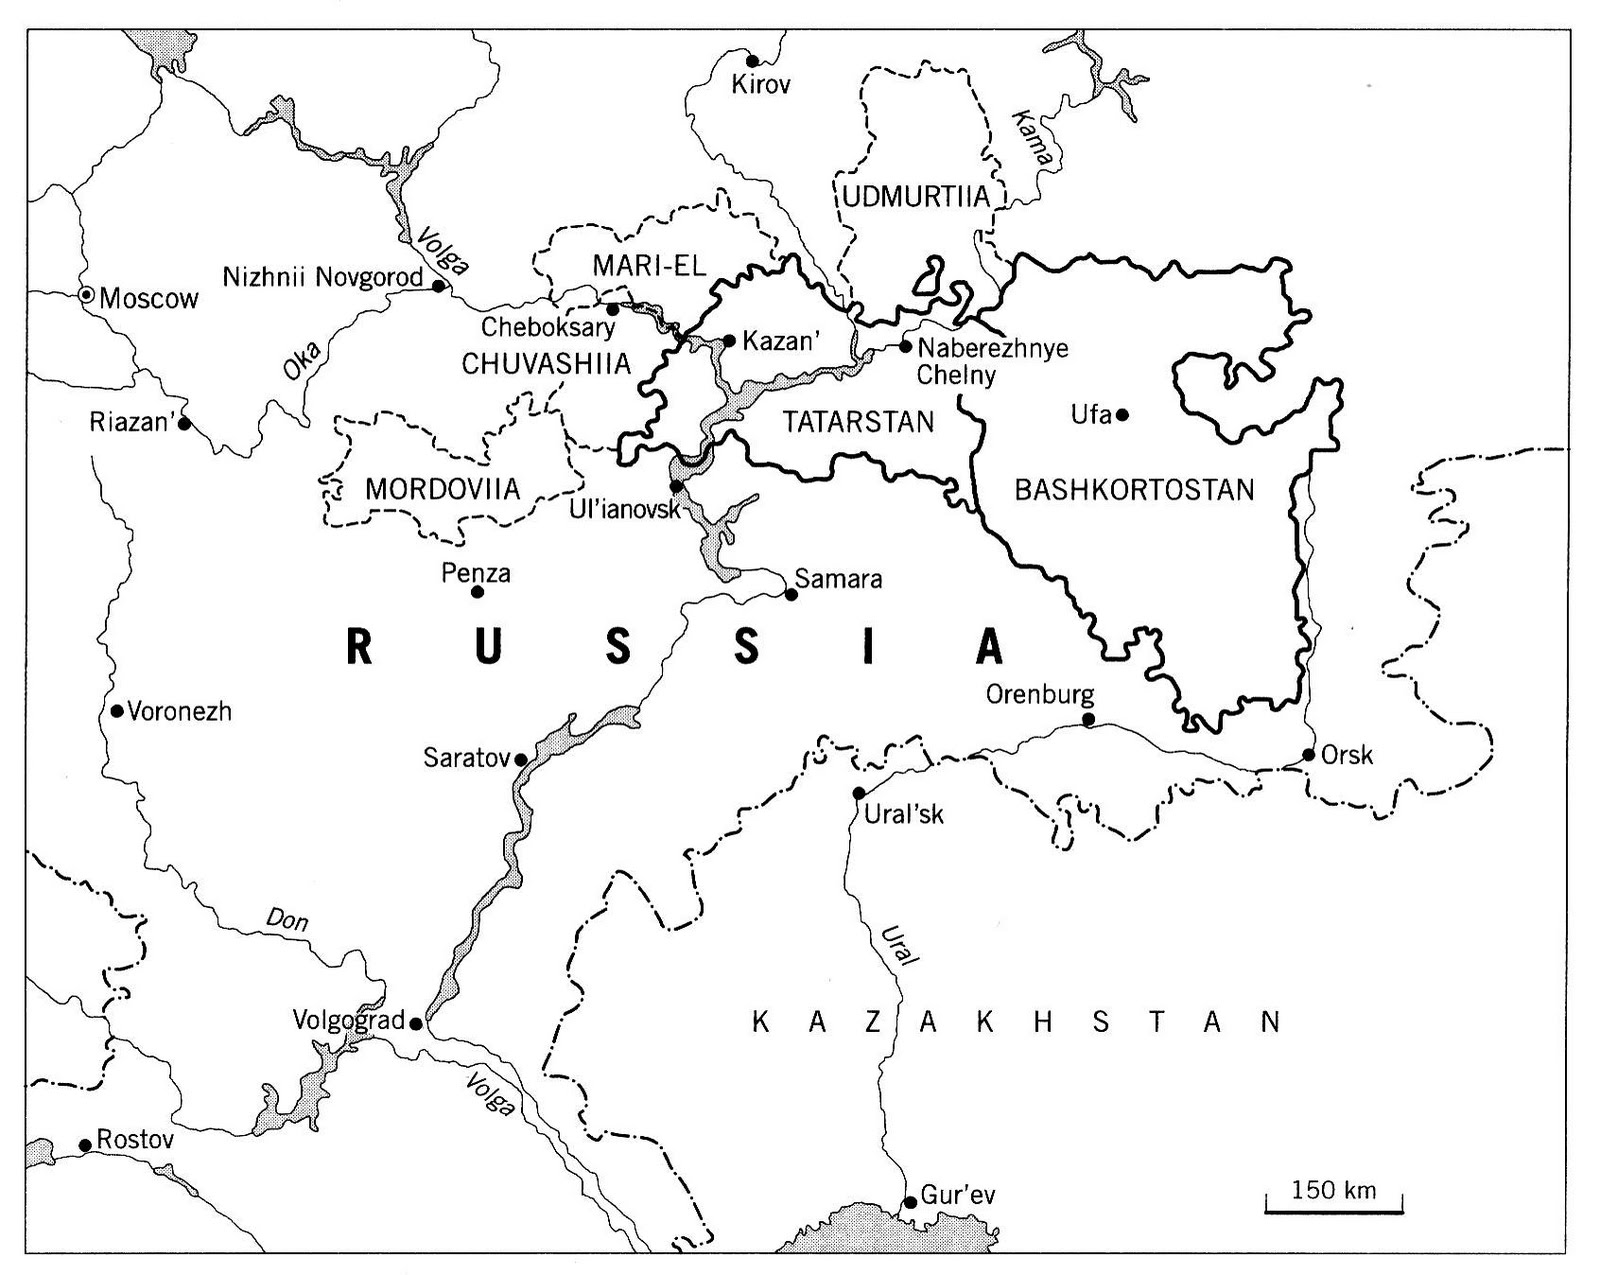 The Peremech Lounge Tatarstan Bashkortostan